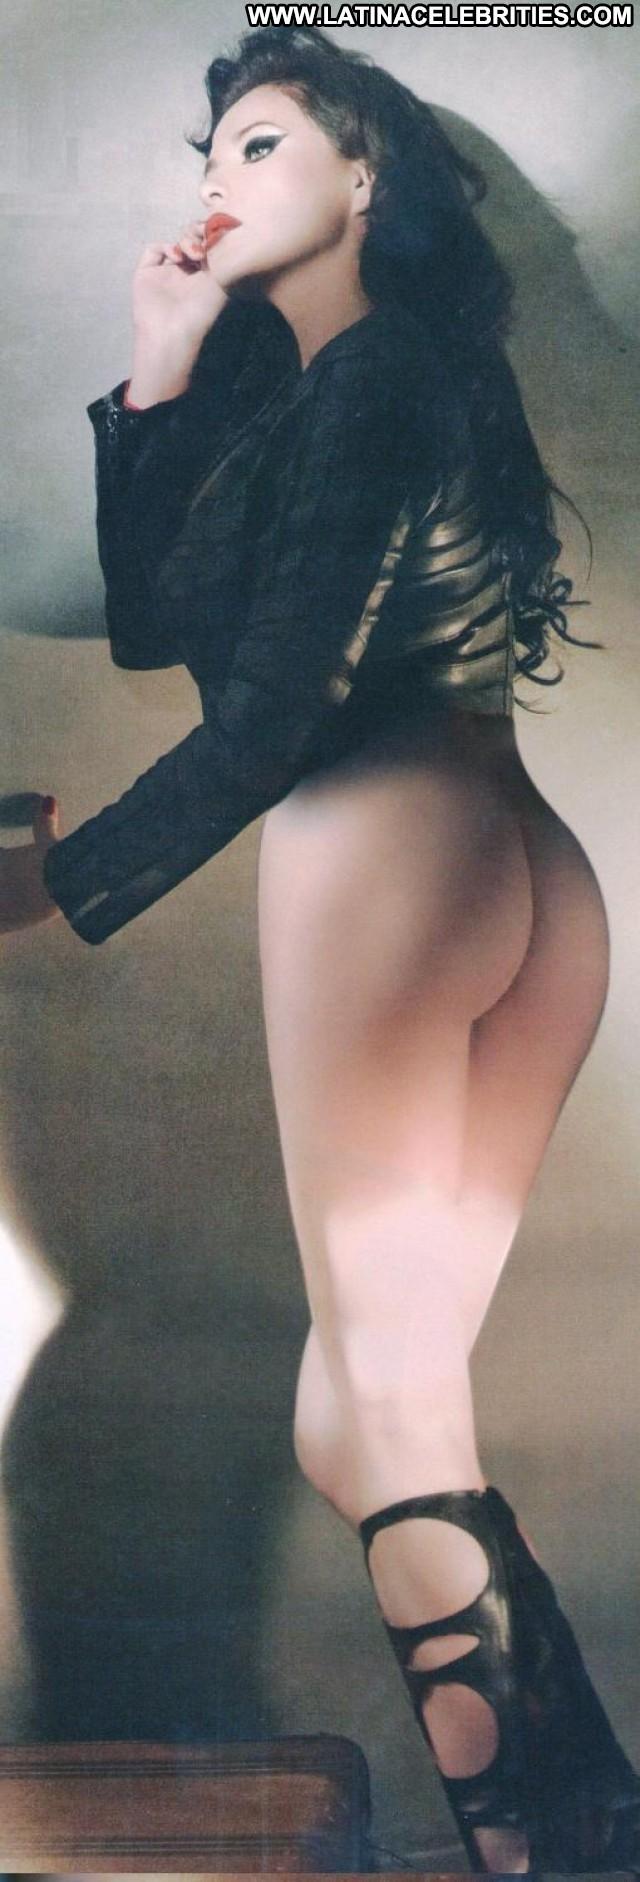 Arleth Teran Miscellaneous Stunning Playmate Medium Tits Brunette